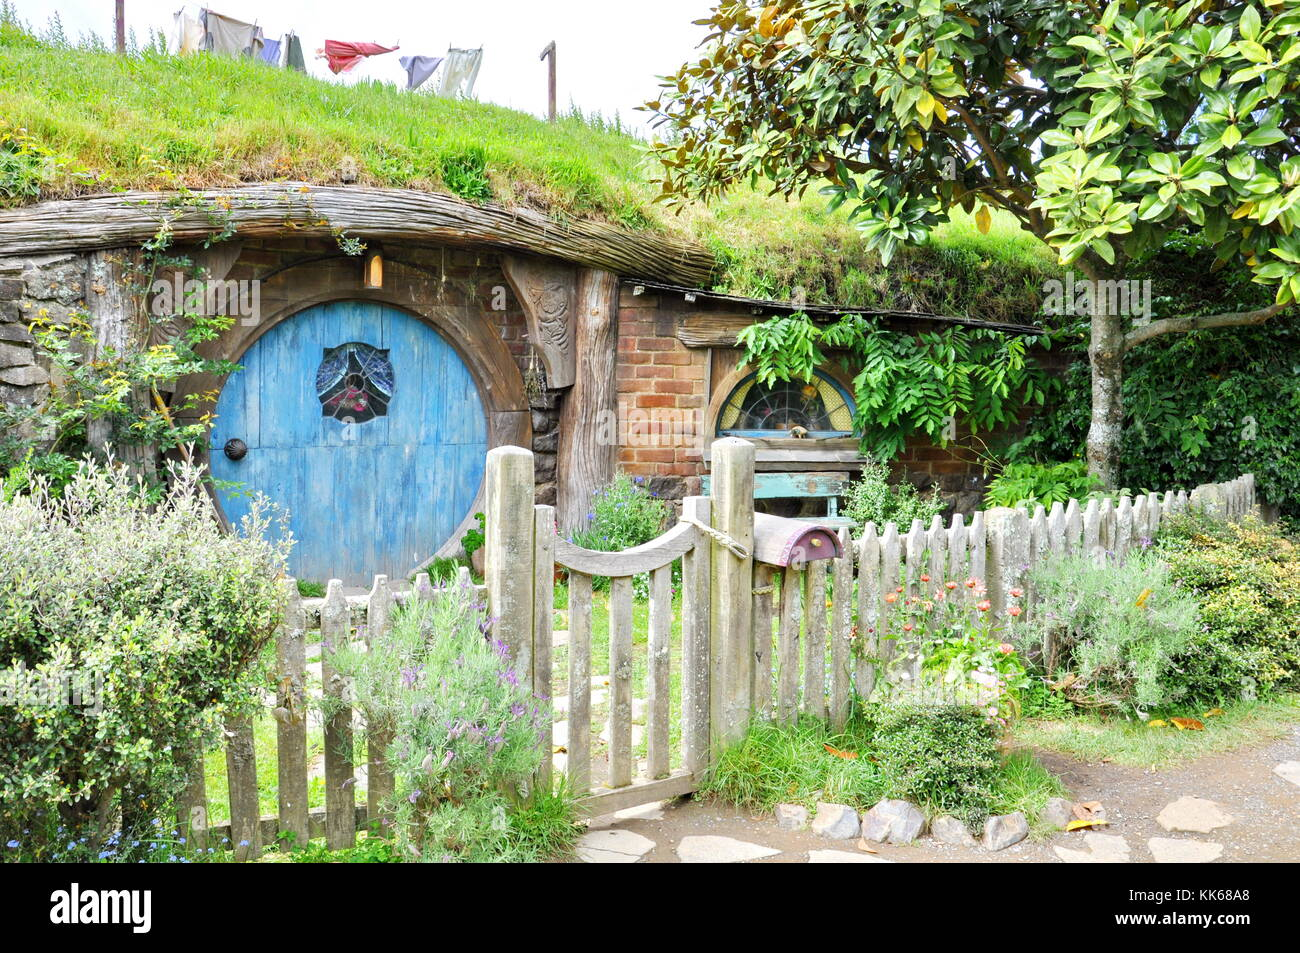 Matamata Neuseeland November 2016 Hobbit Haus Mit Blauen Tür An